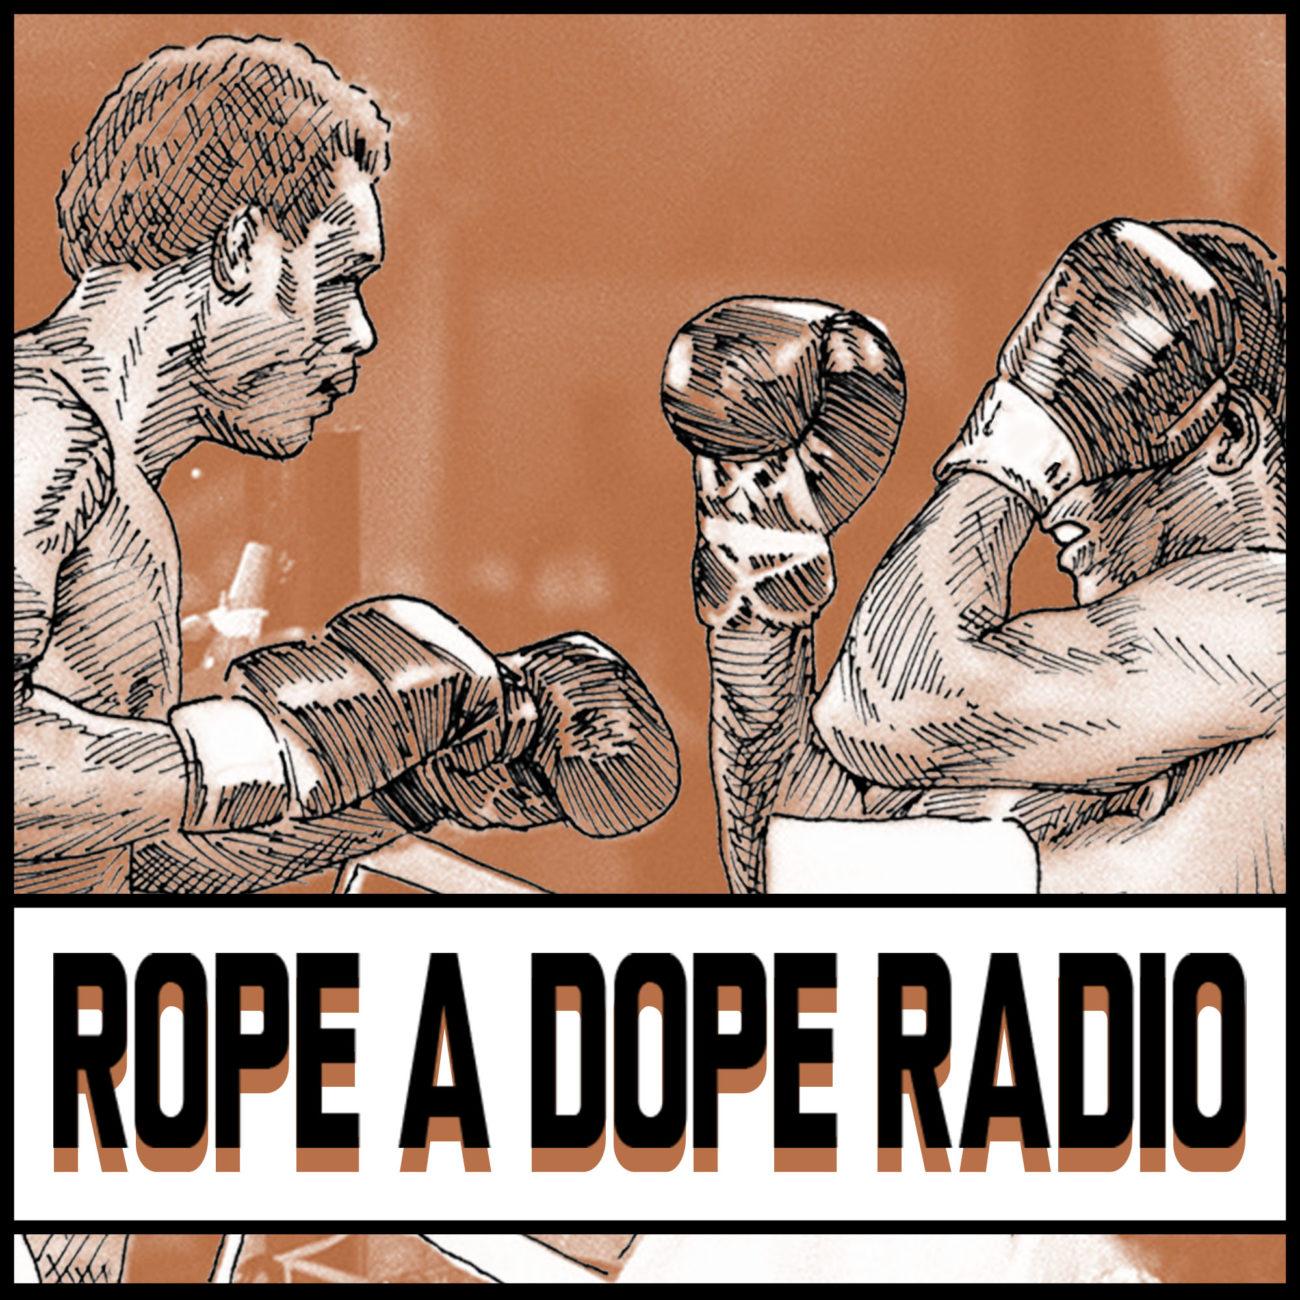 Rope A Dope Radio: AJ vs Lennox beef! Kovalev vs Yarde